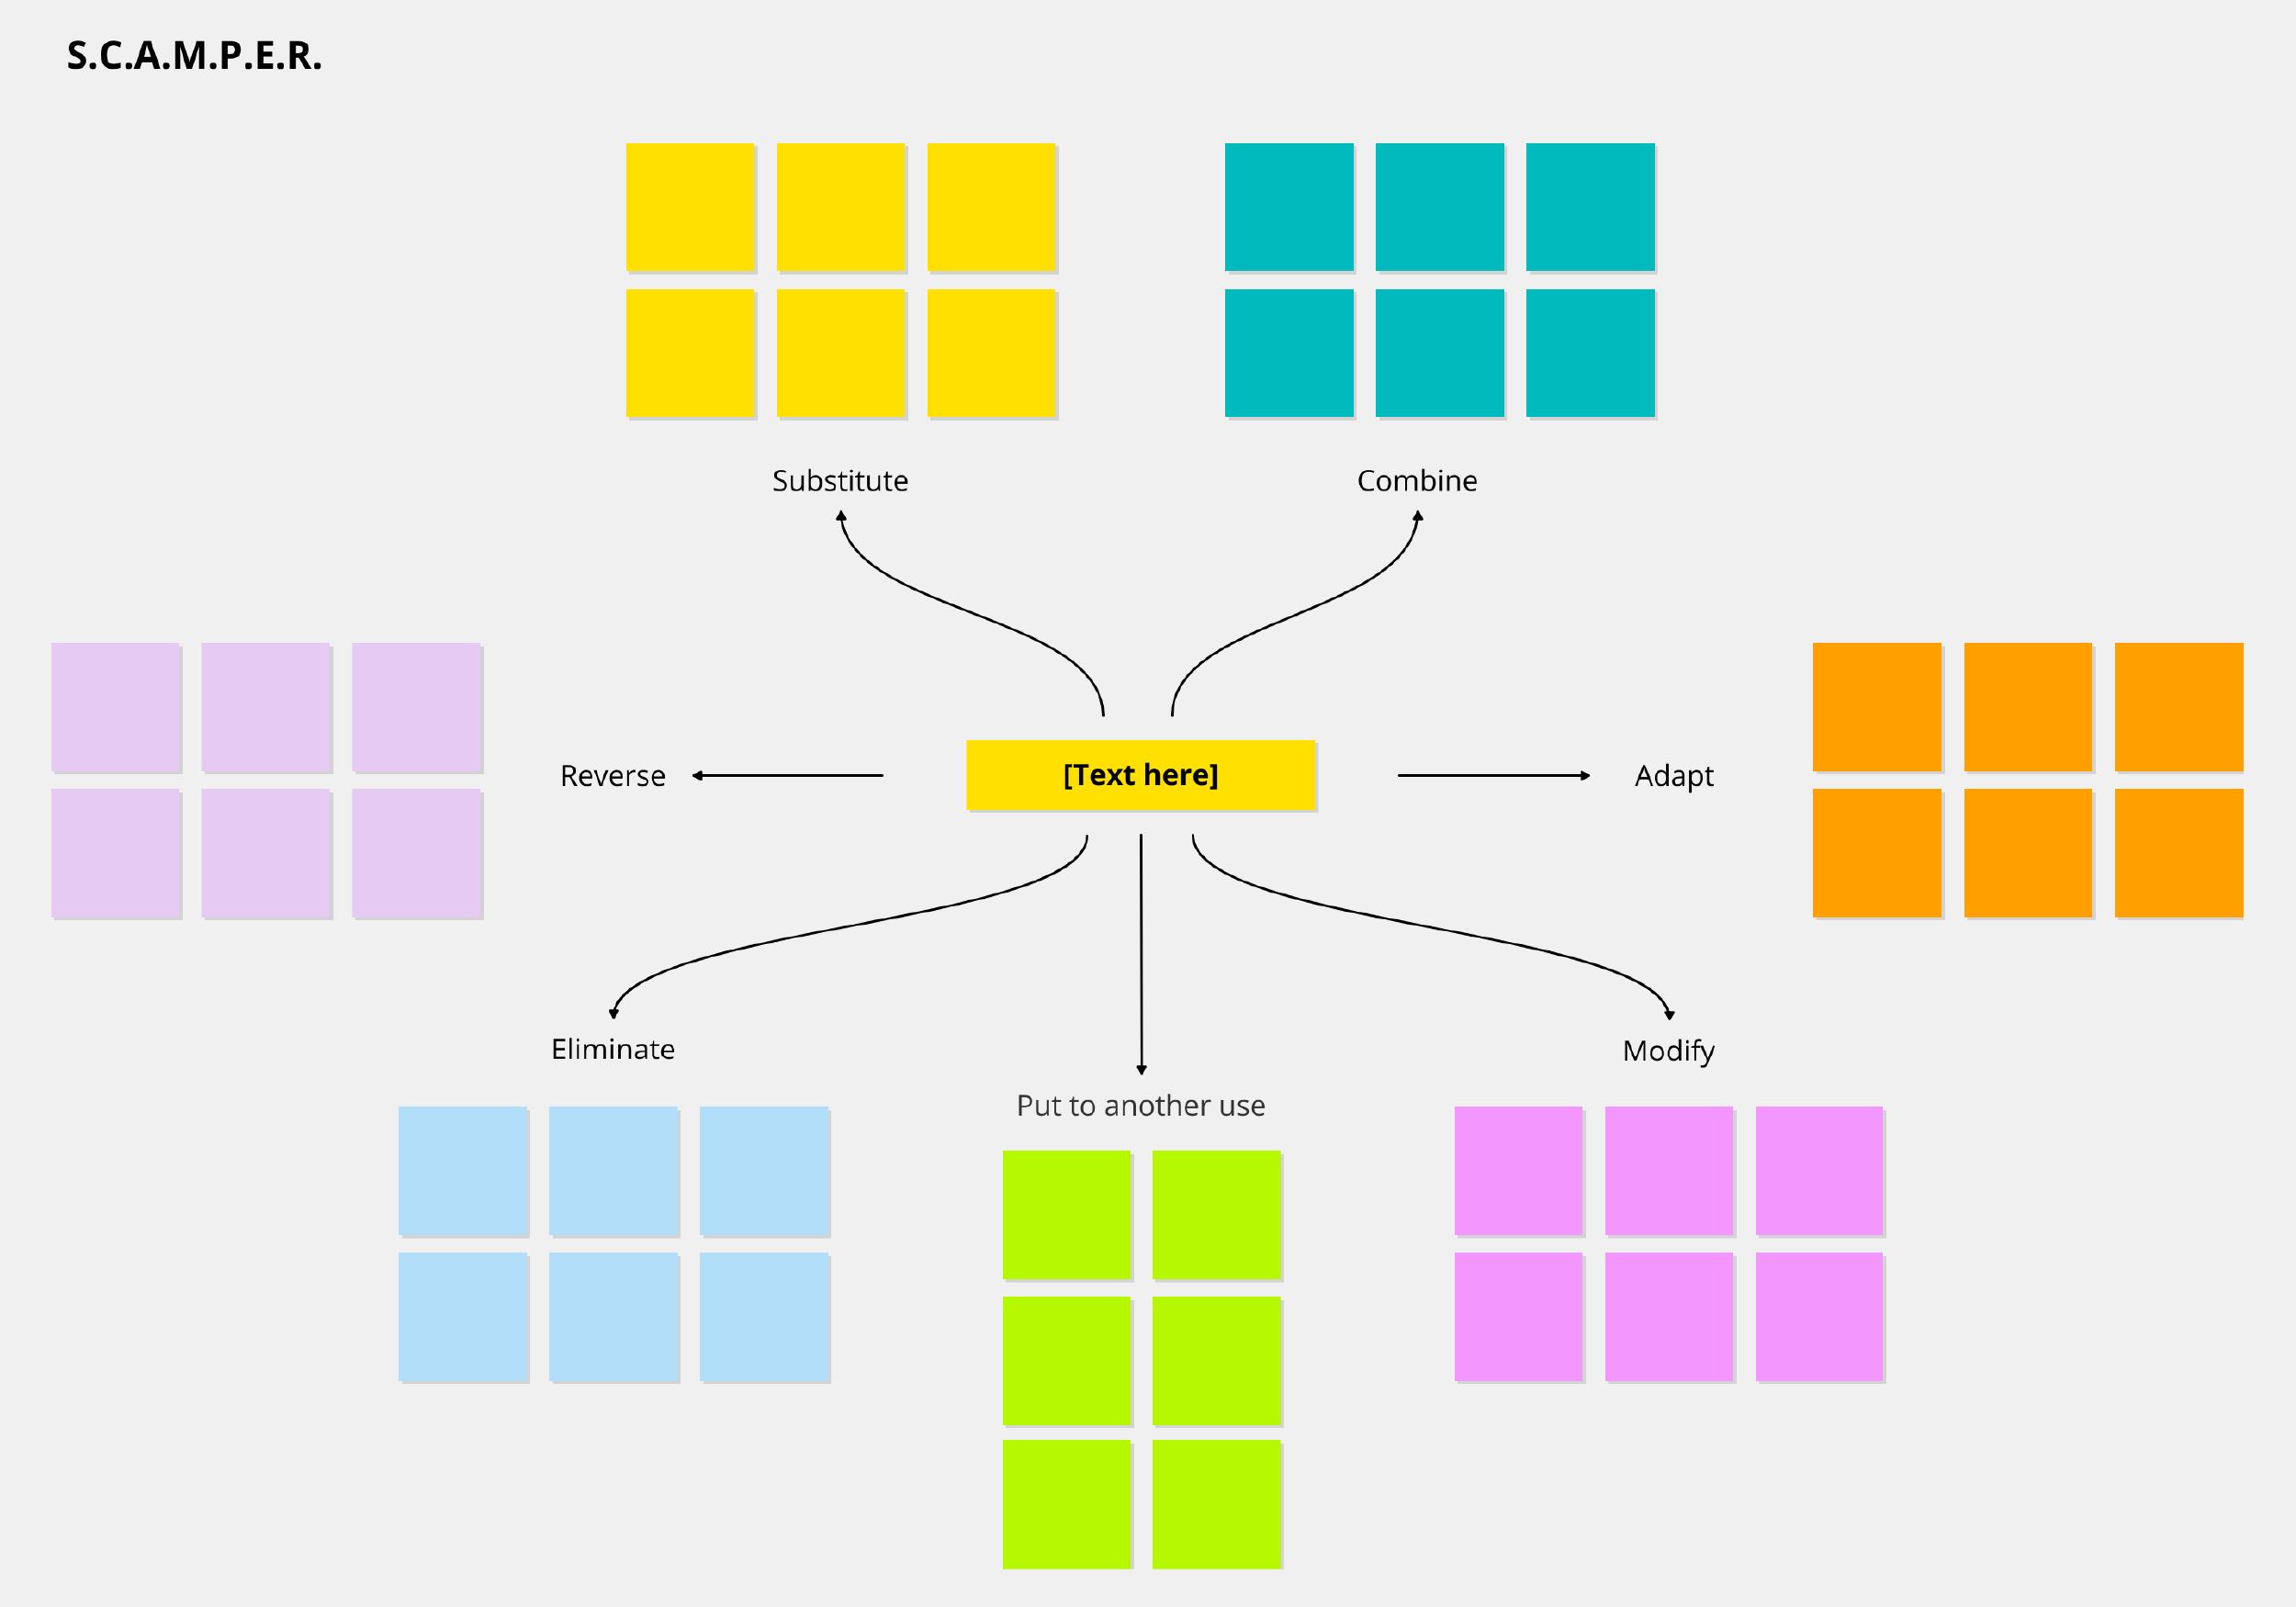 Brainstorming techniques: SCAMPER